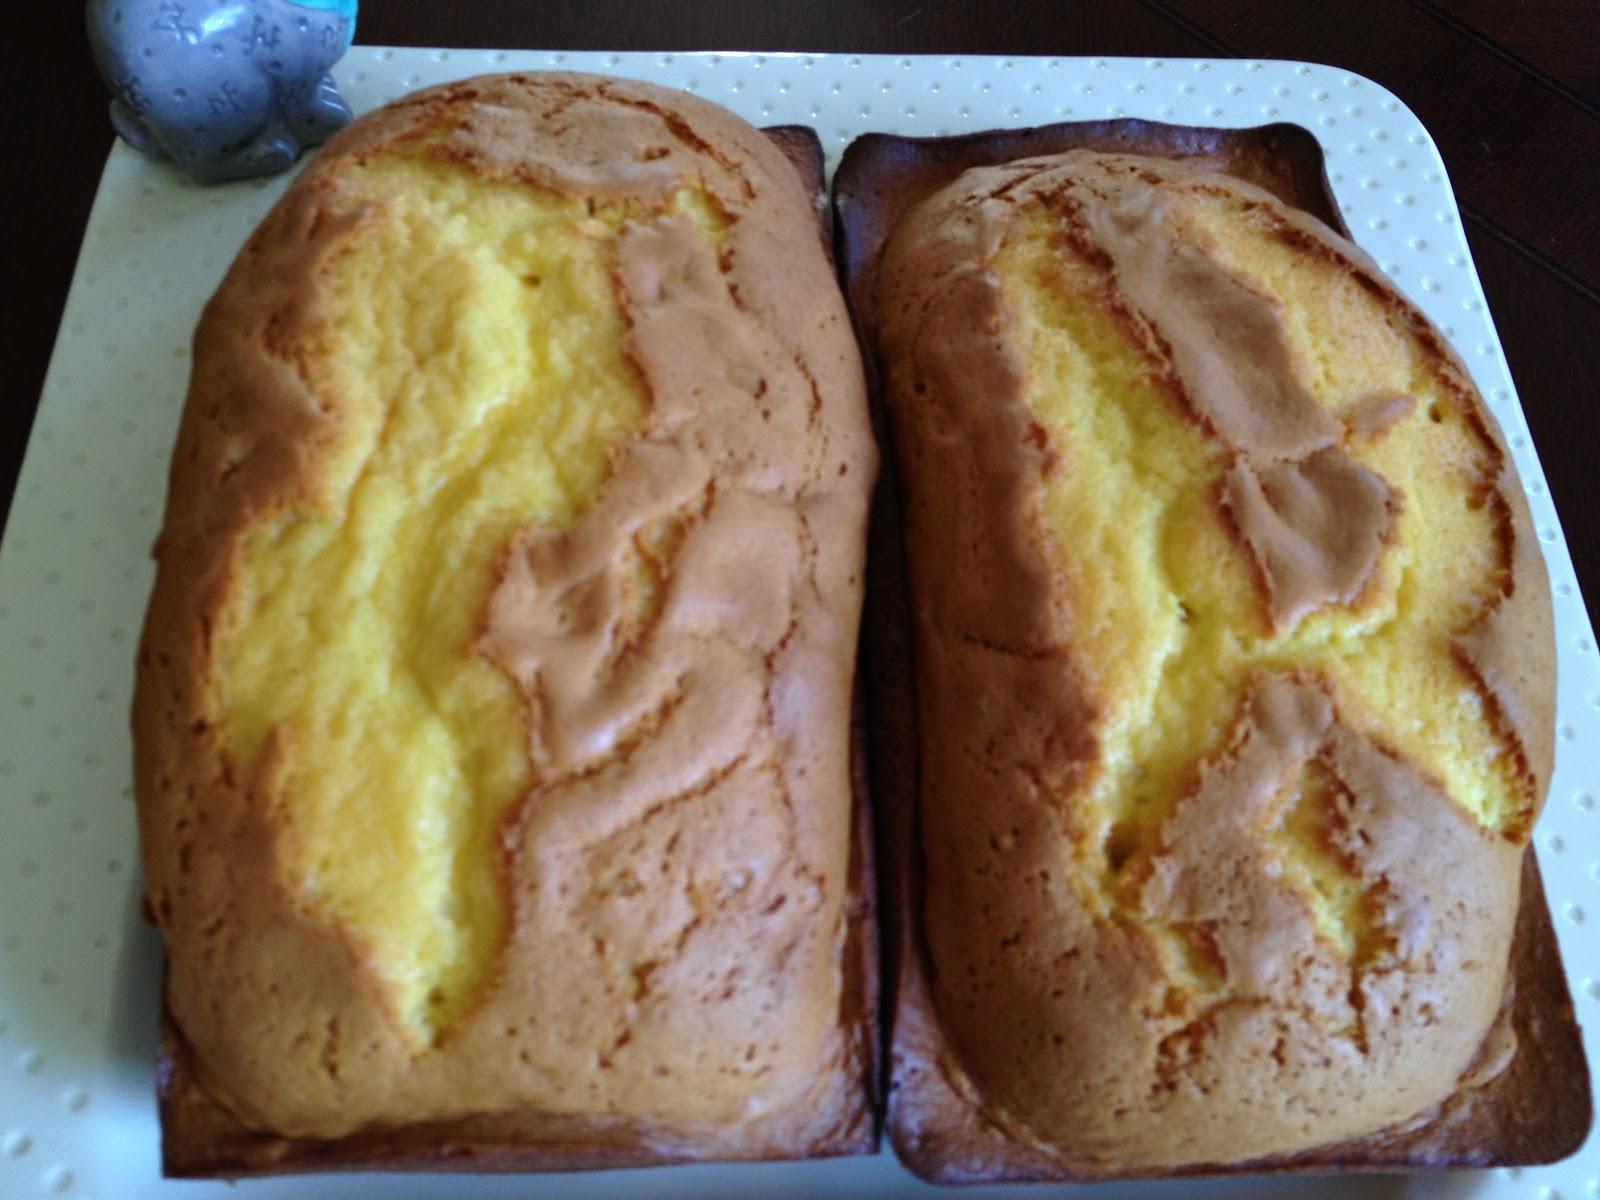 Easter Dessert Lemon Pound Cake Served 2 Ways Close To Home